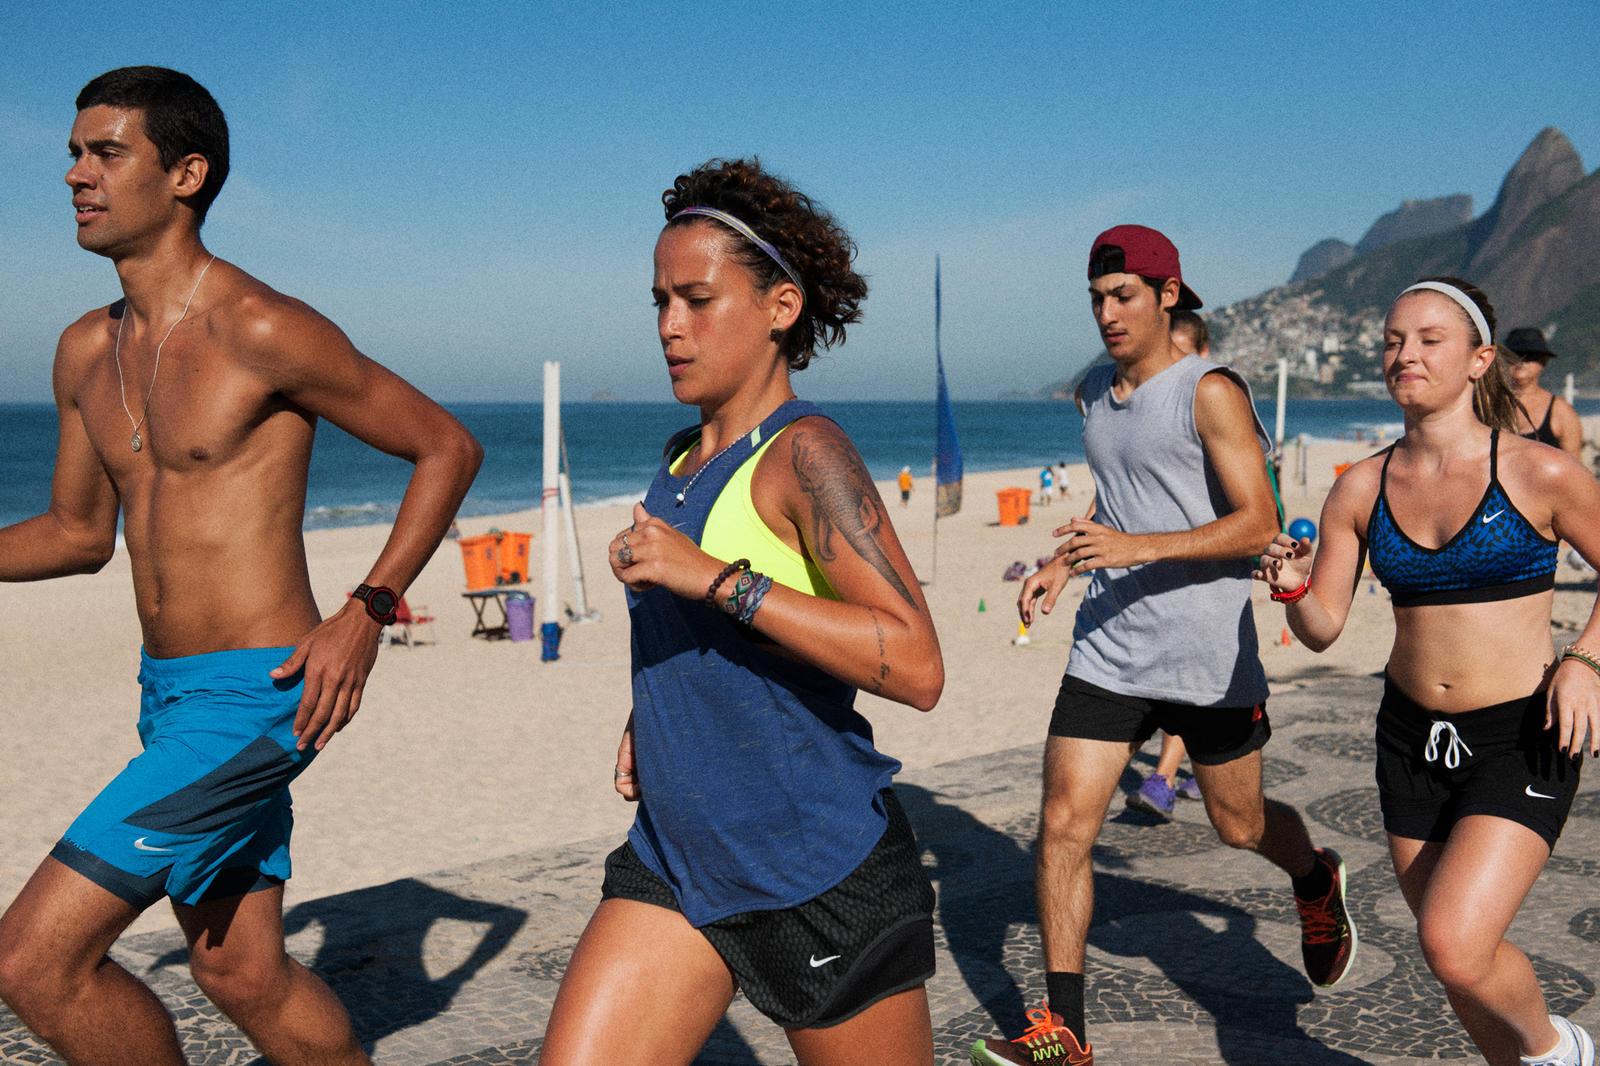 NikeVemJunto_Run_1_native_1600